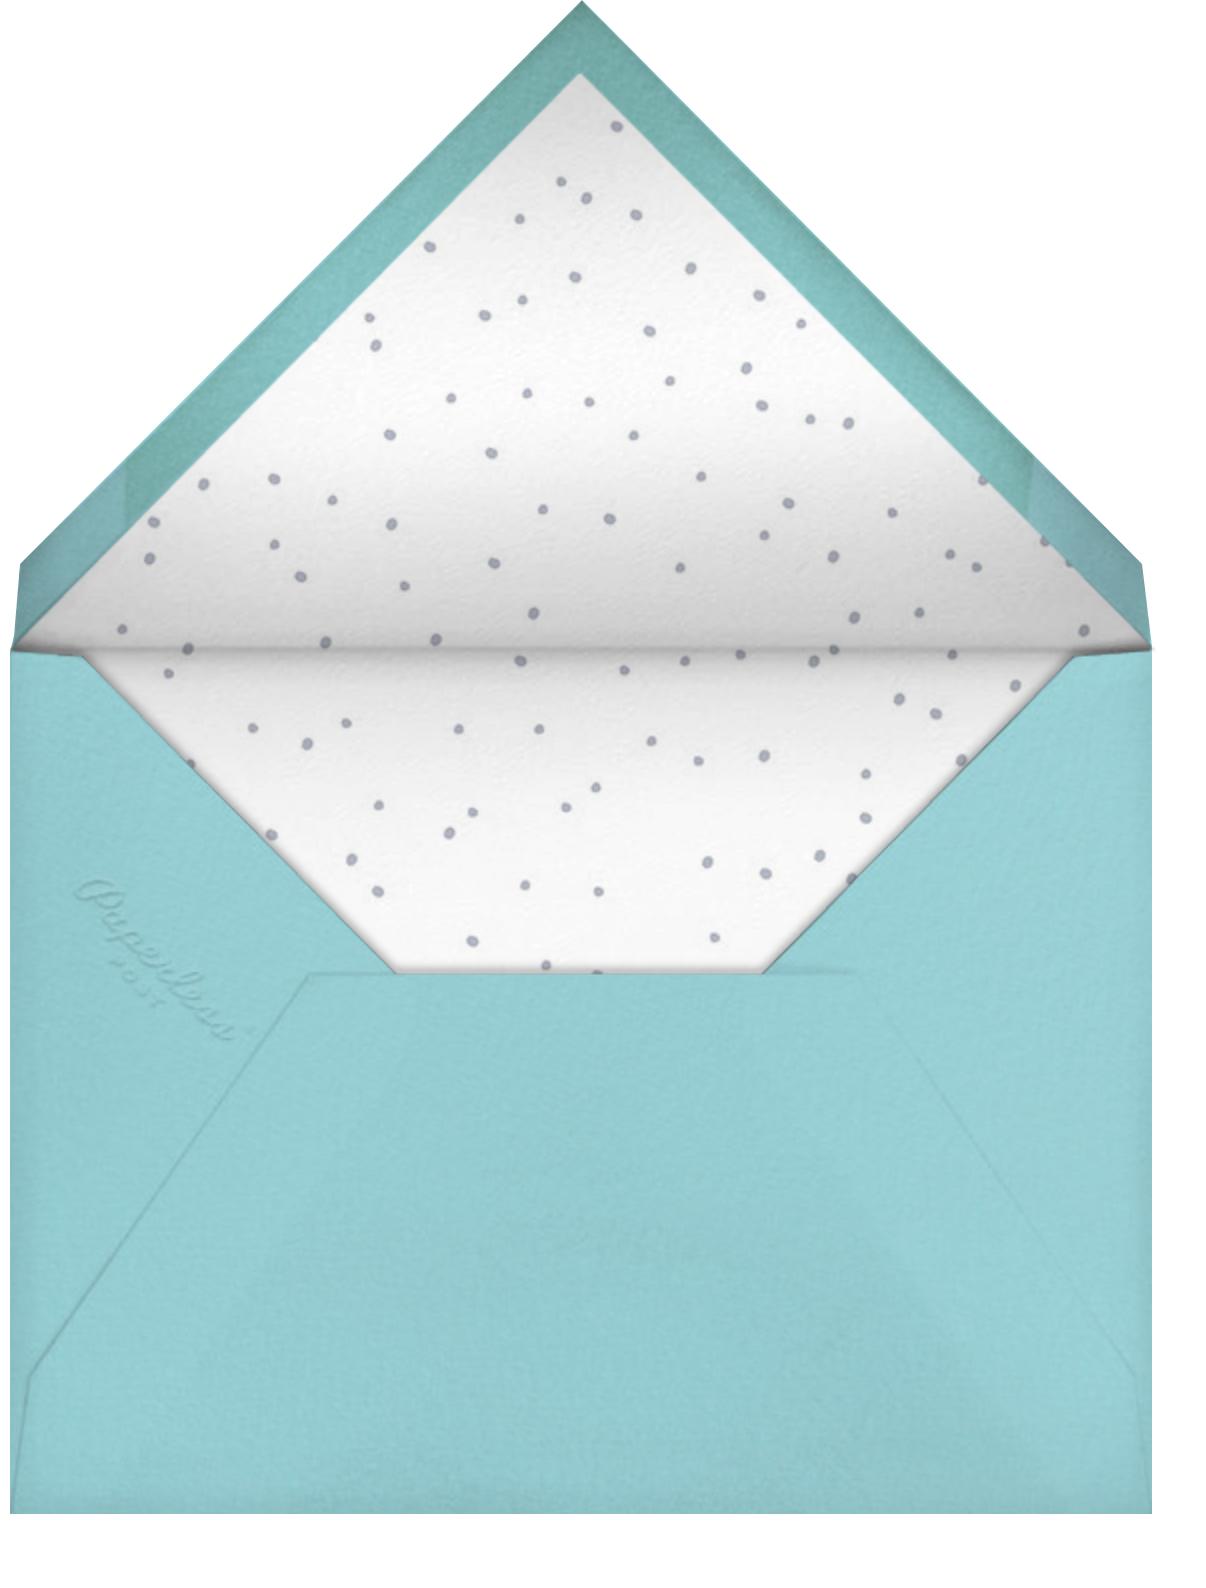 Birdie's Town (Horizontal) - Little Cube - Moving - envelope back